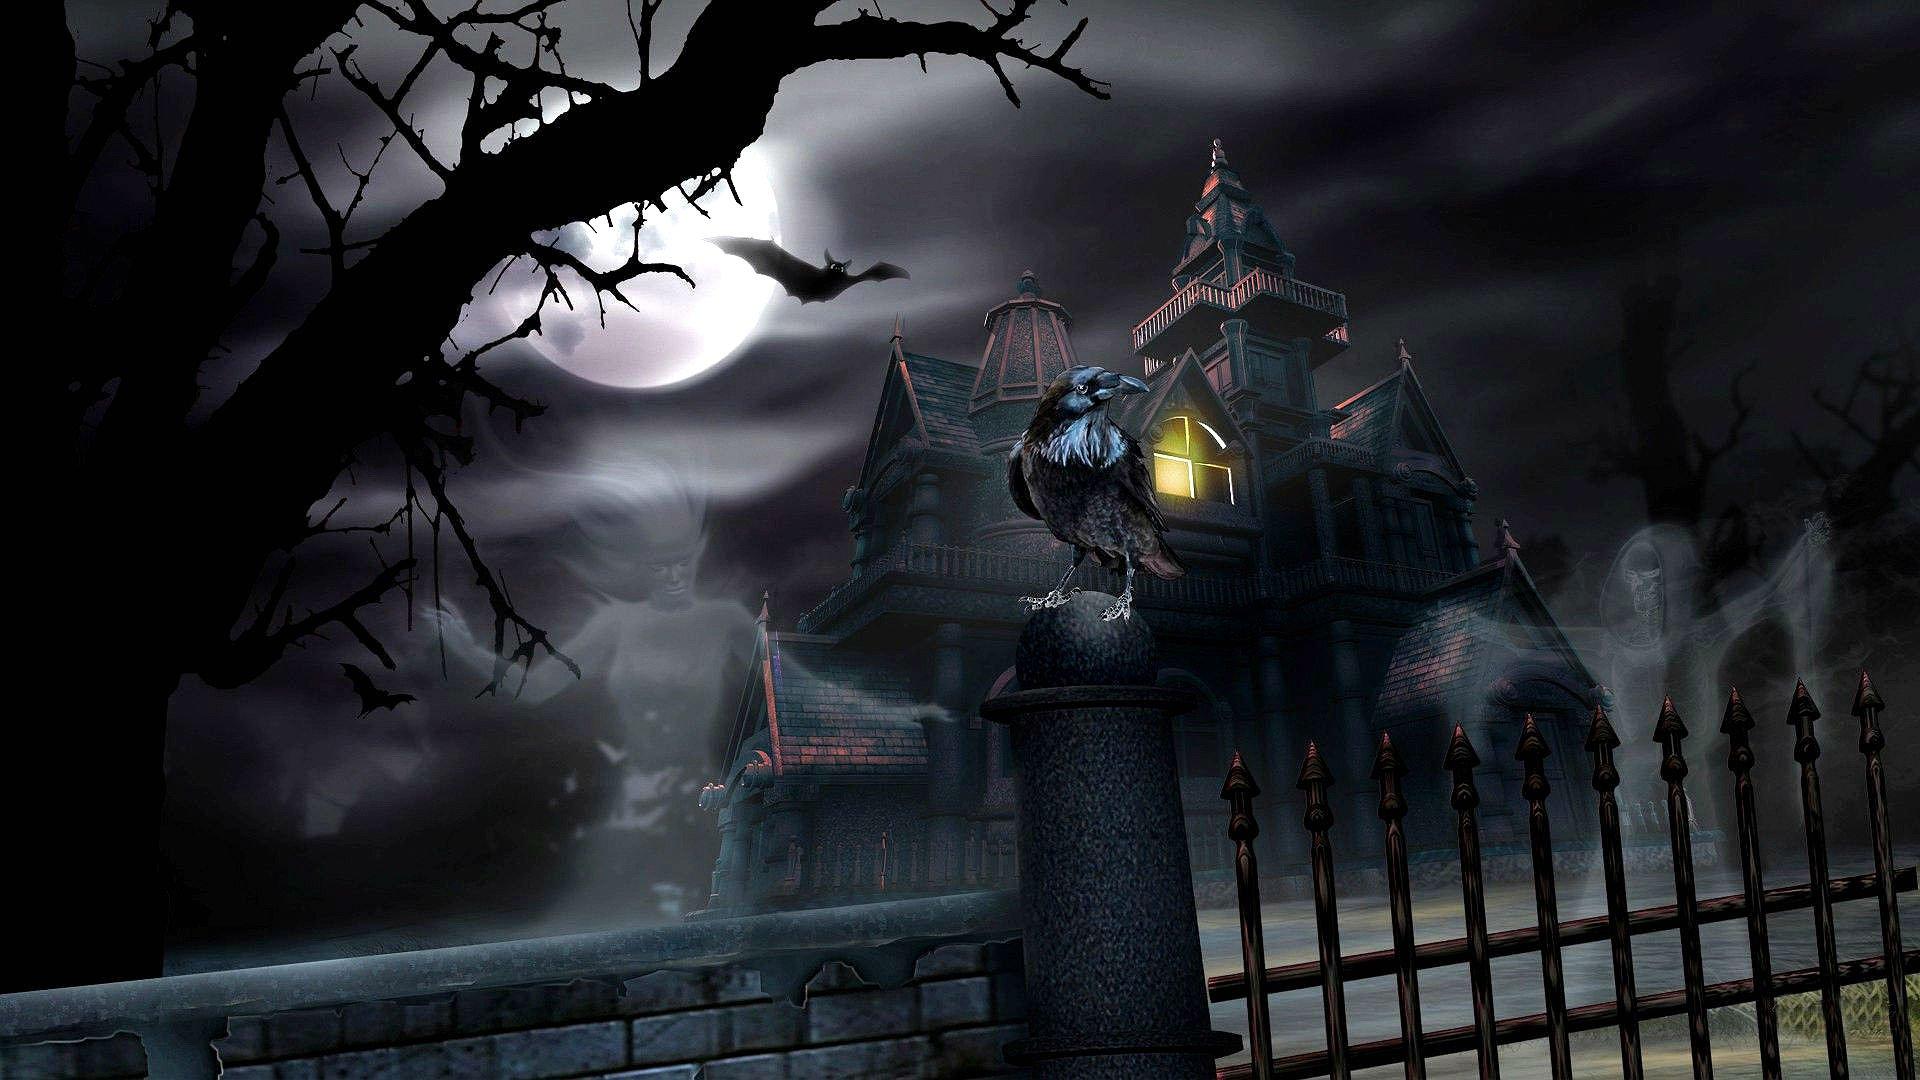 HALLOWEEN dark haunted house spooky wallpaper 1920x1080 1920x1080